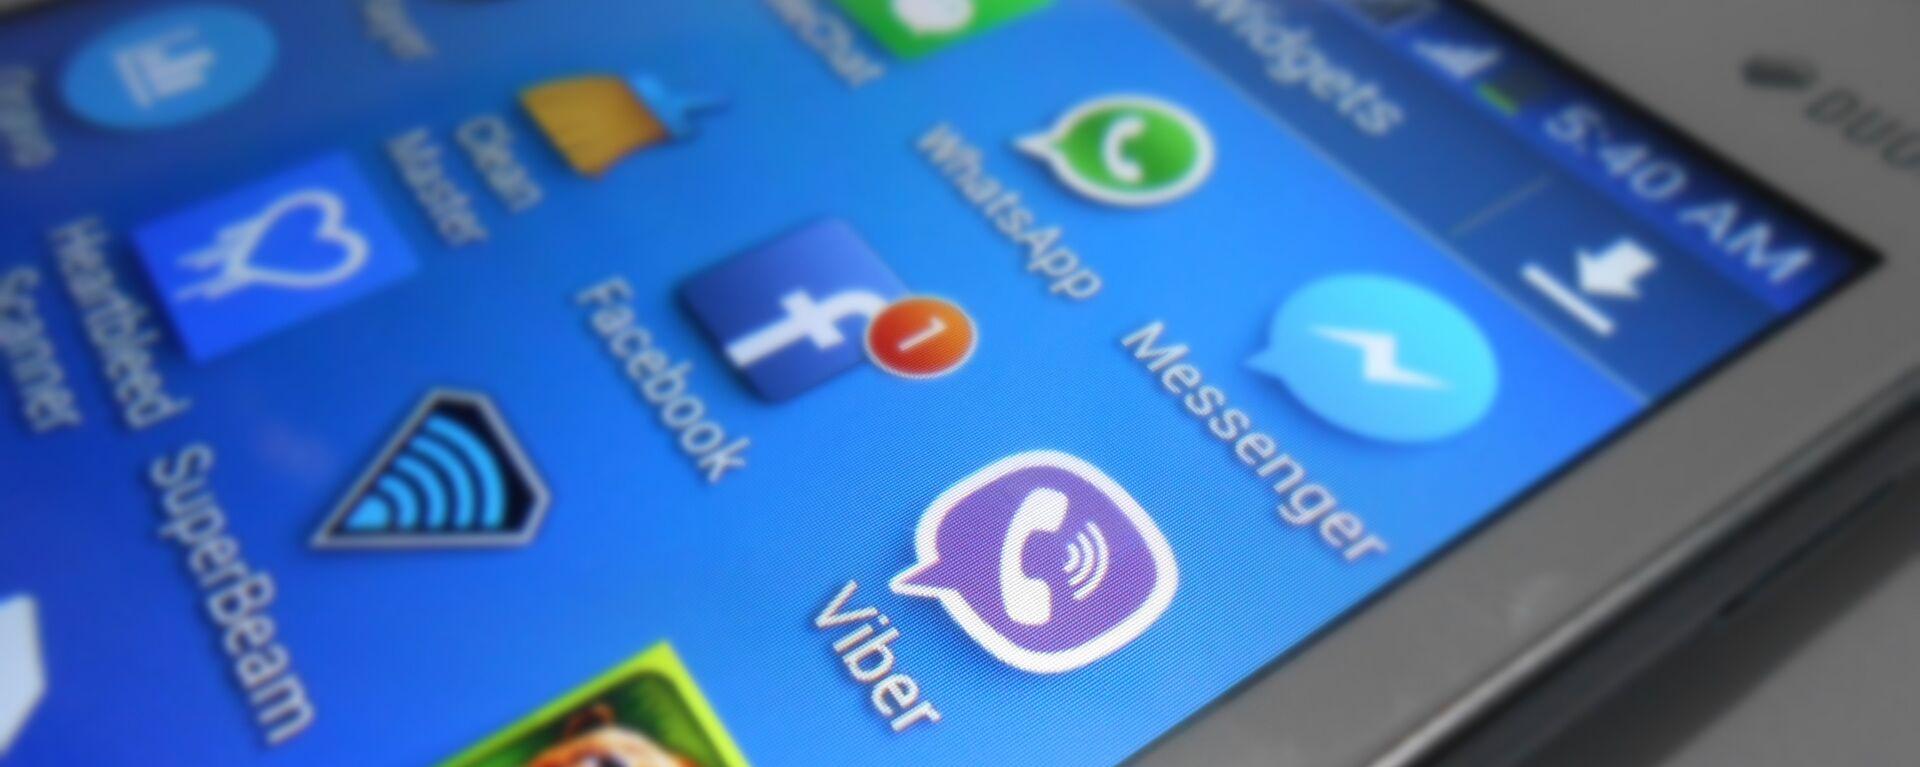 Viber, WhatsApp and other applications. - Sputnik Italia, 1920, 01.07.2021